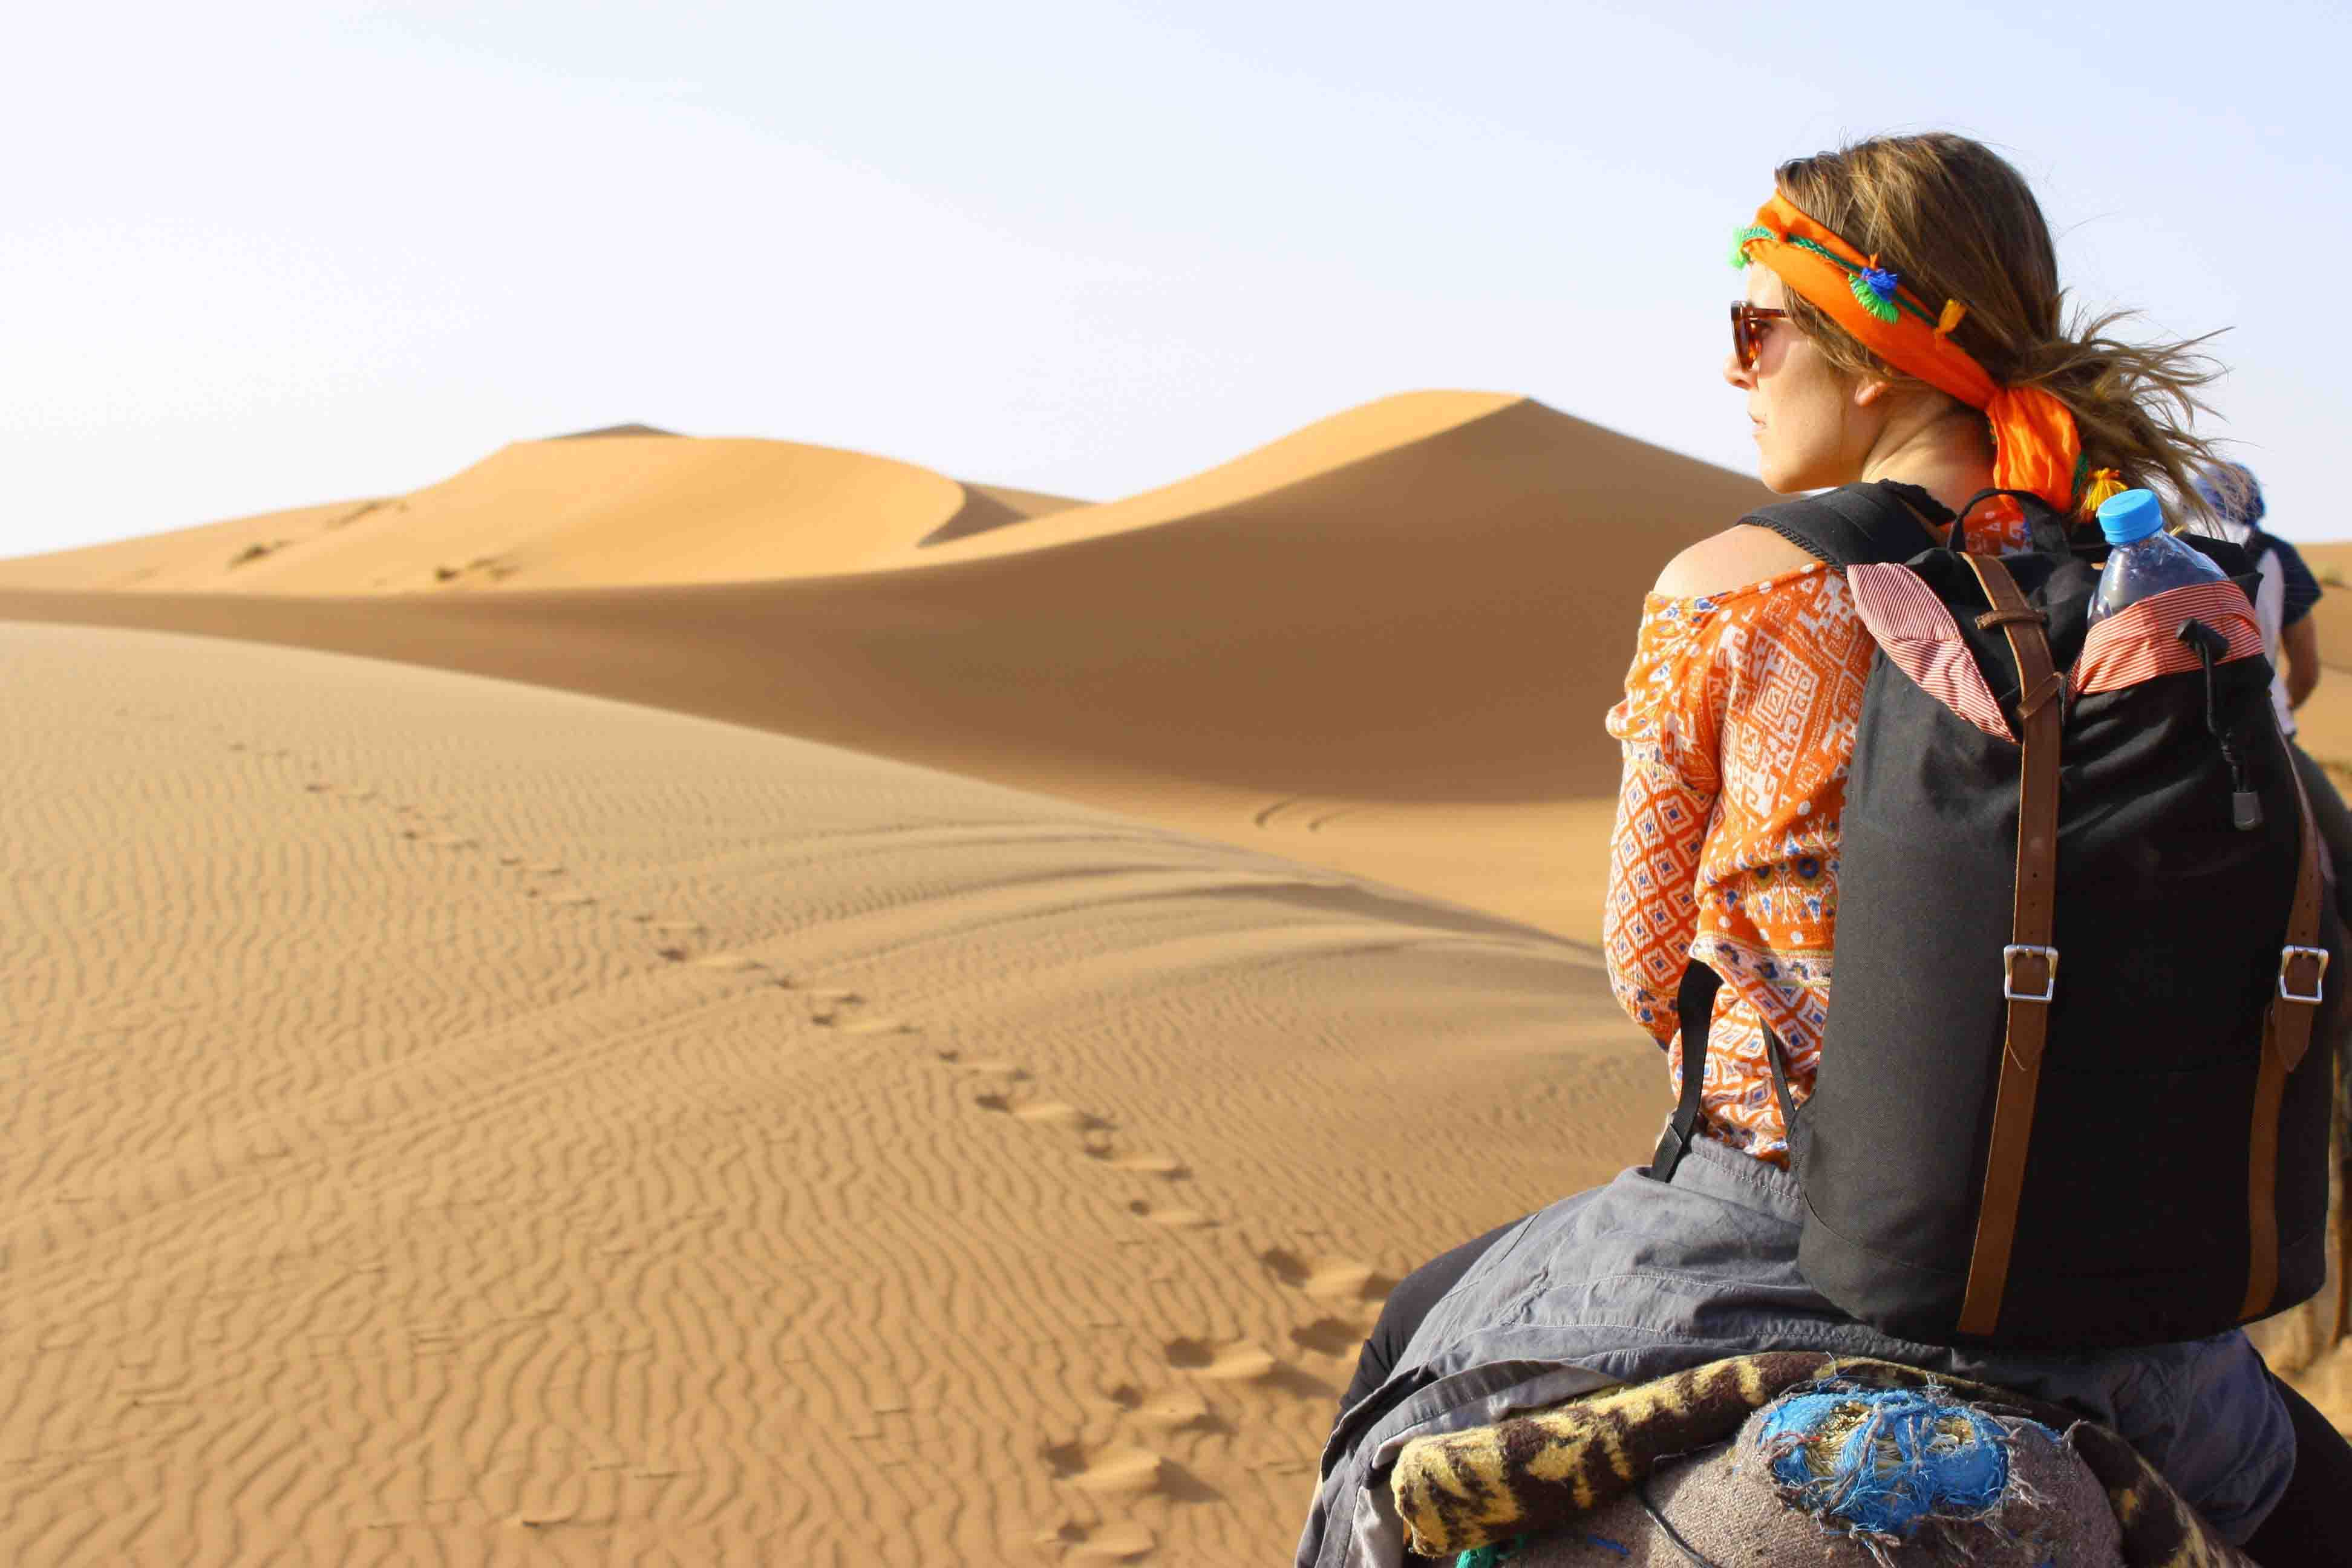 Explore the desert.